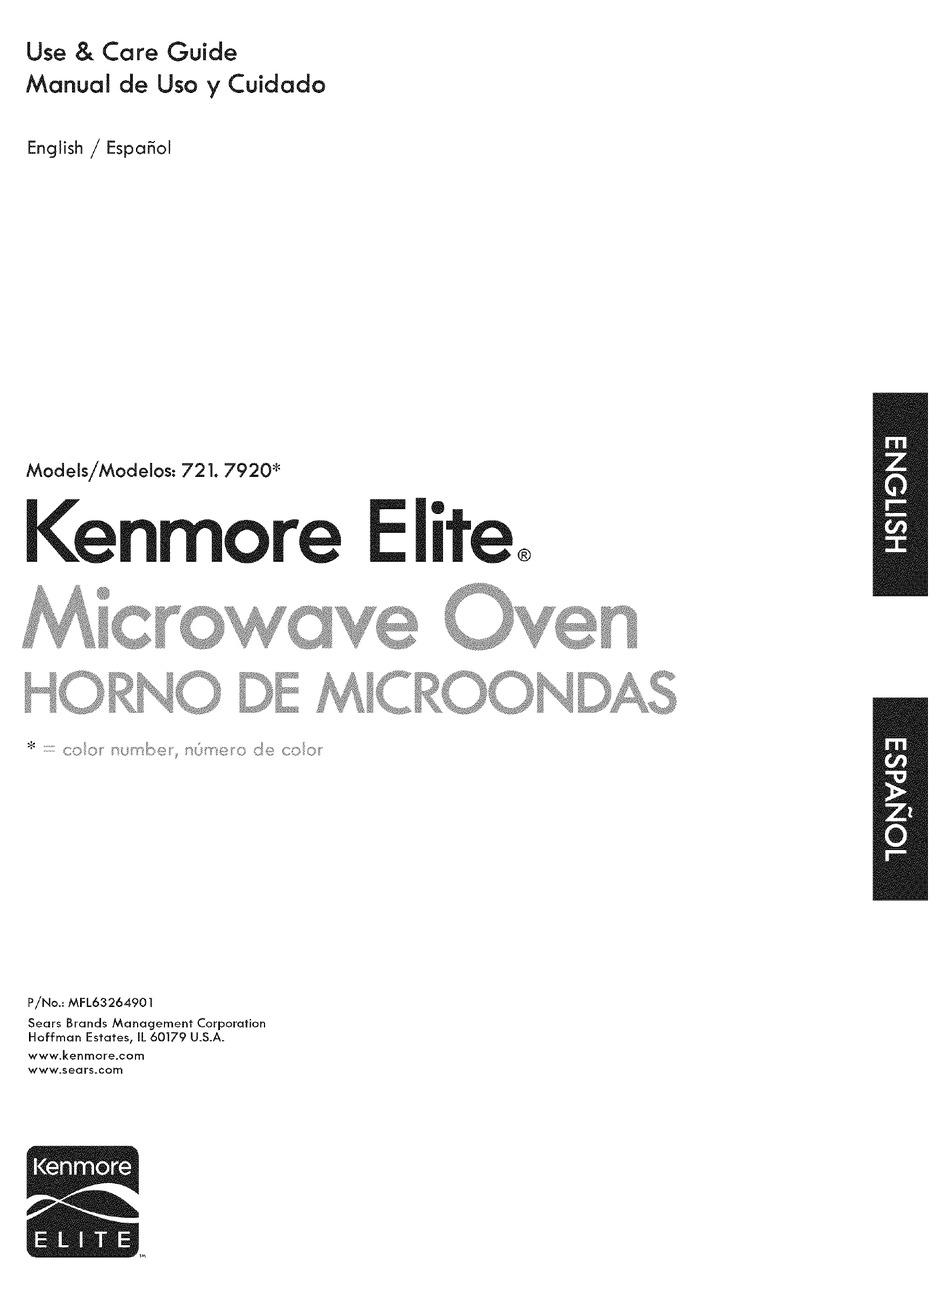 Kenmore Elite 721 7920 Use And Care Manual Pdf Download Manualslib